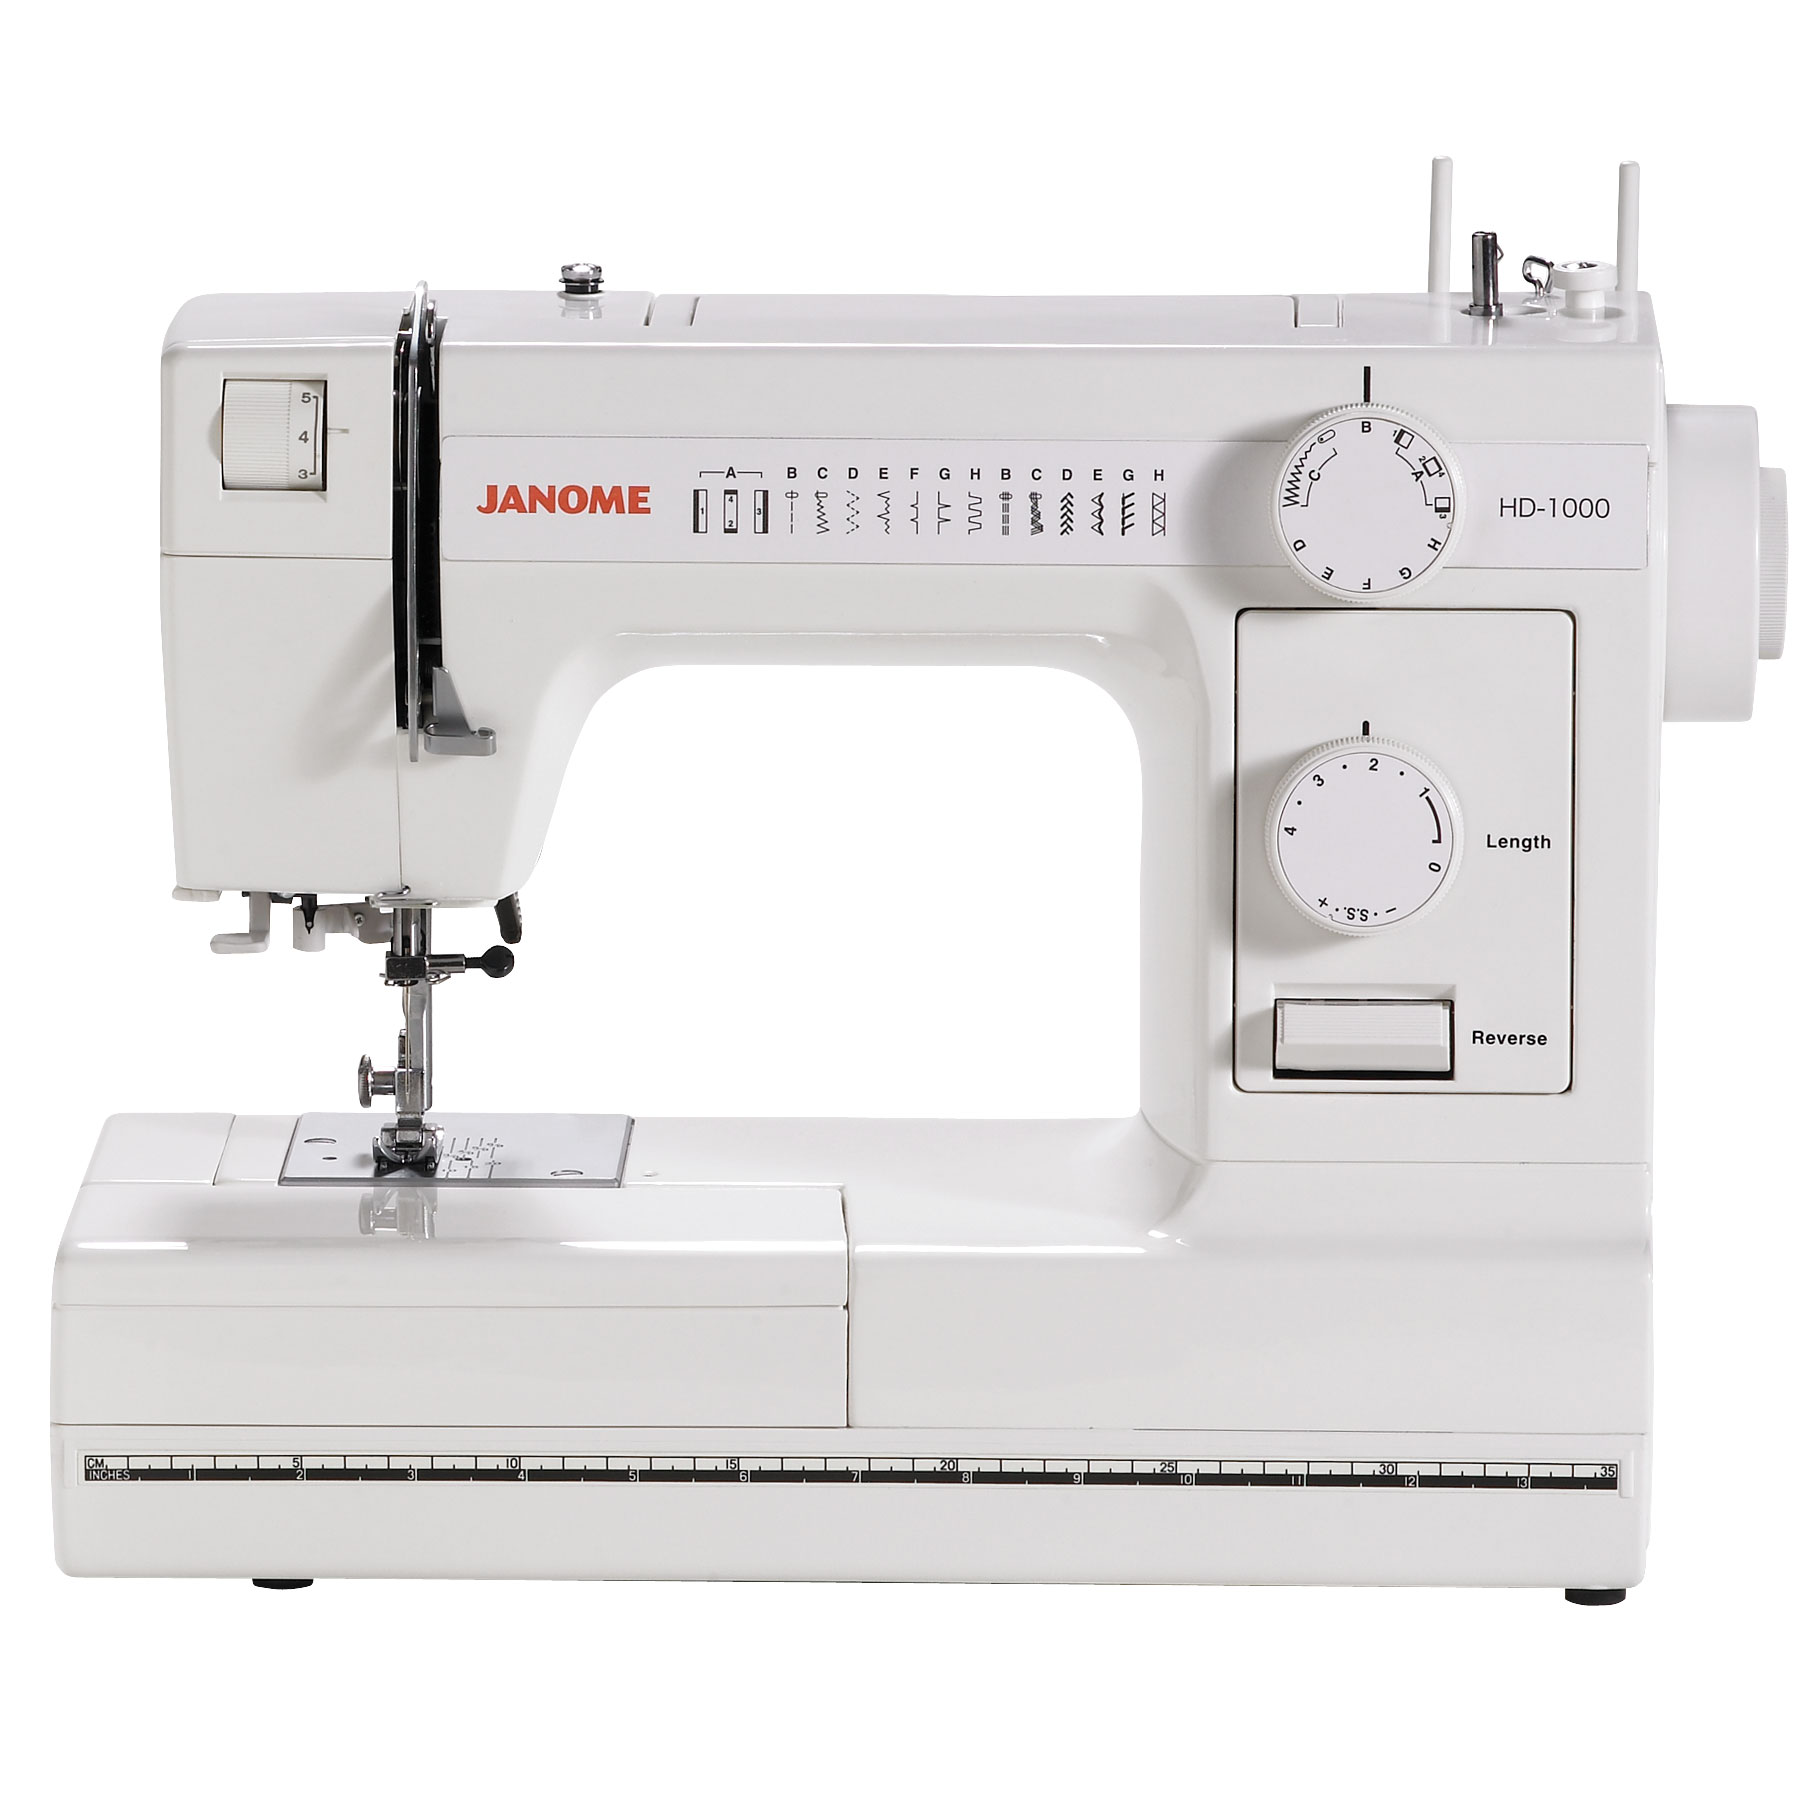 Refurbished Janome HD1000 Mechanical Sewing Machine